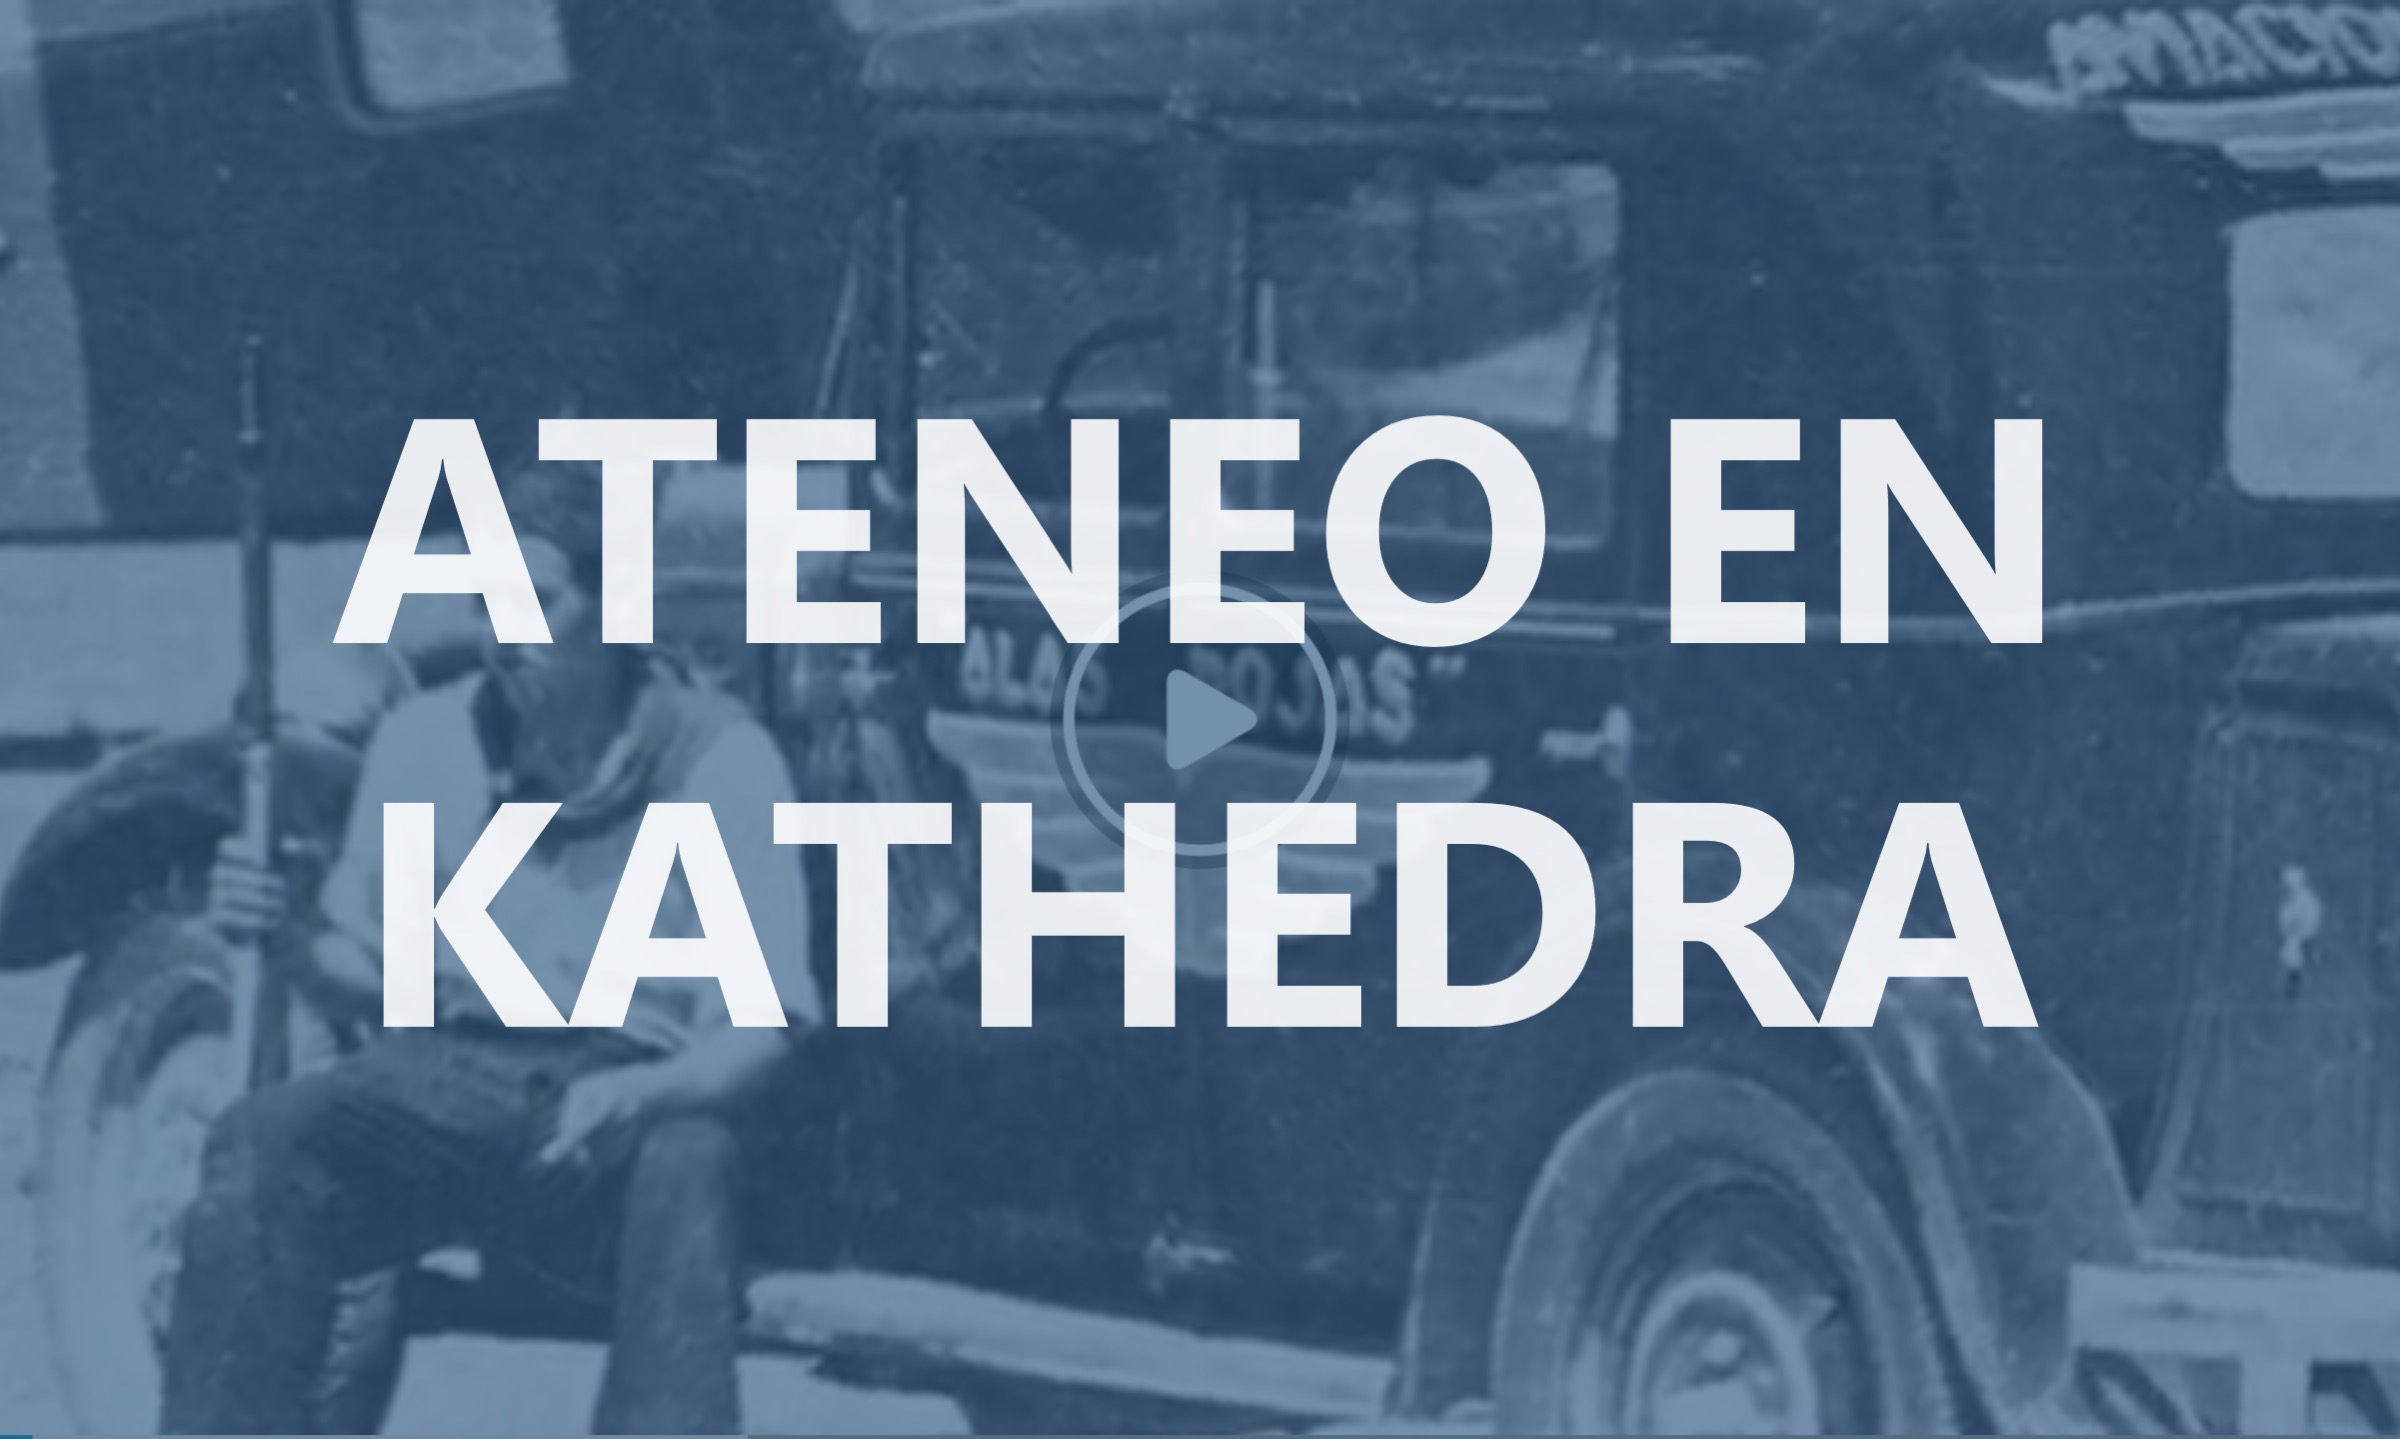 Ateneo en Kathedra